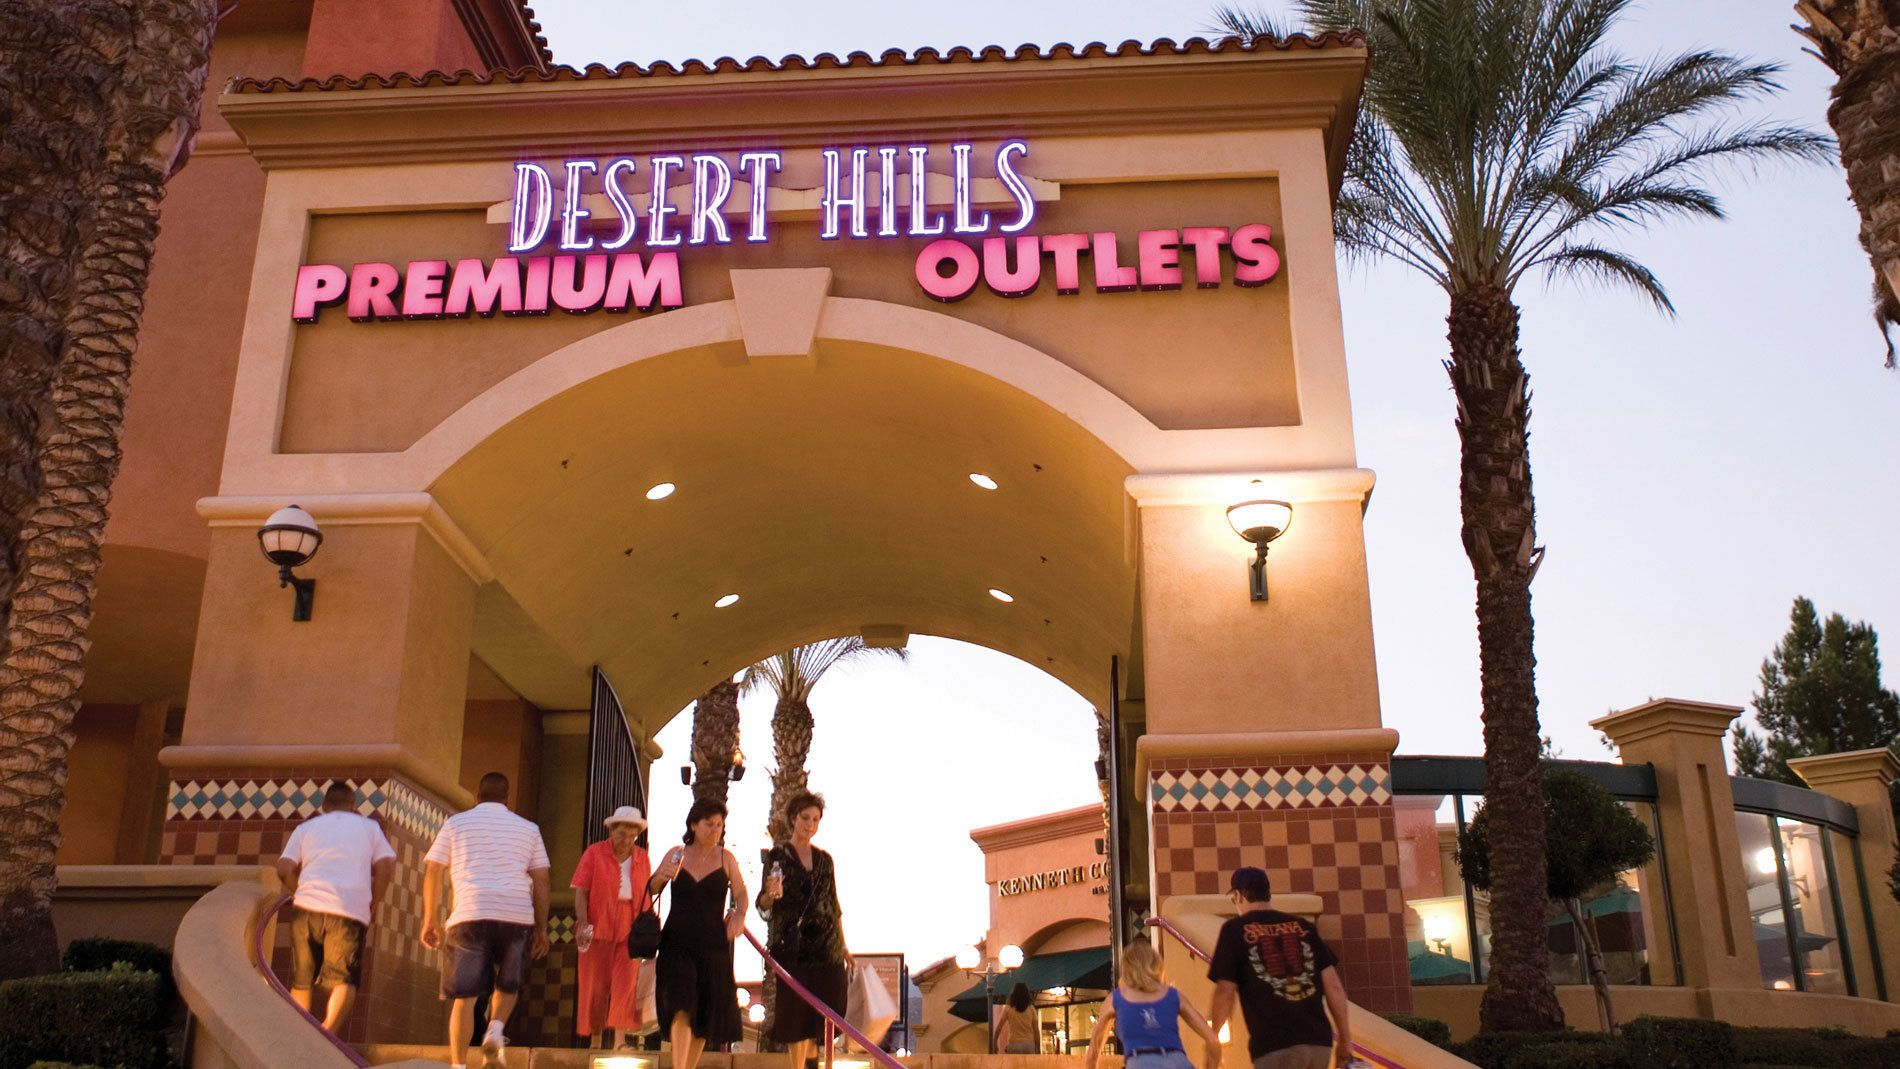 Desert Hills Premium Outlets shopping center in Palm Springs